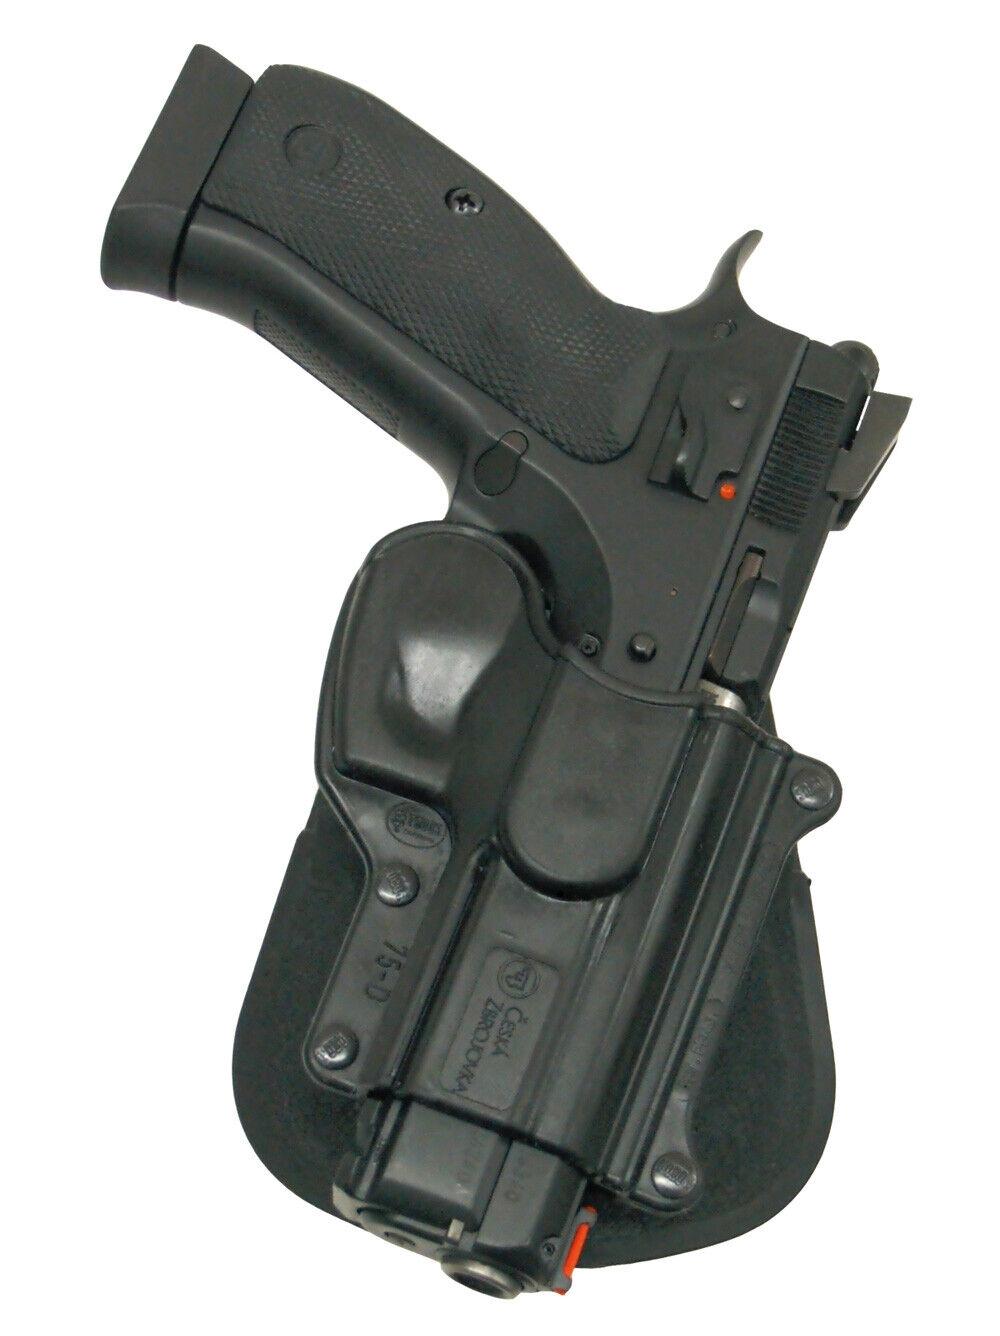 Fobus 360 redo retention paddle holster sarsilmaz defense fs   compact   canik 5